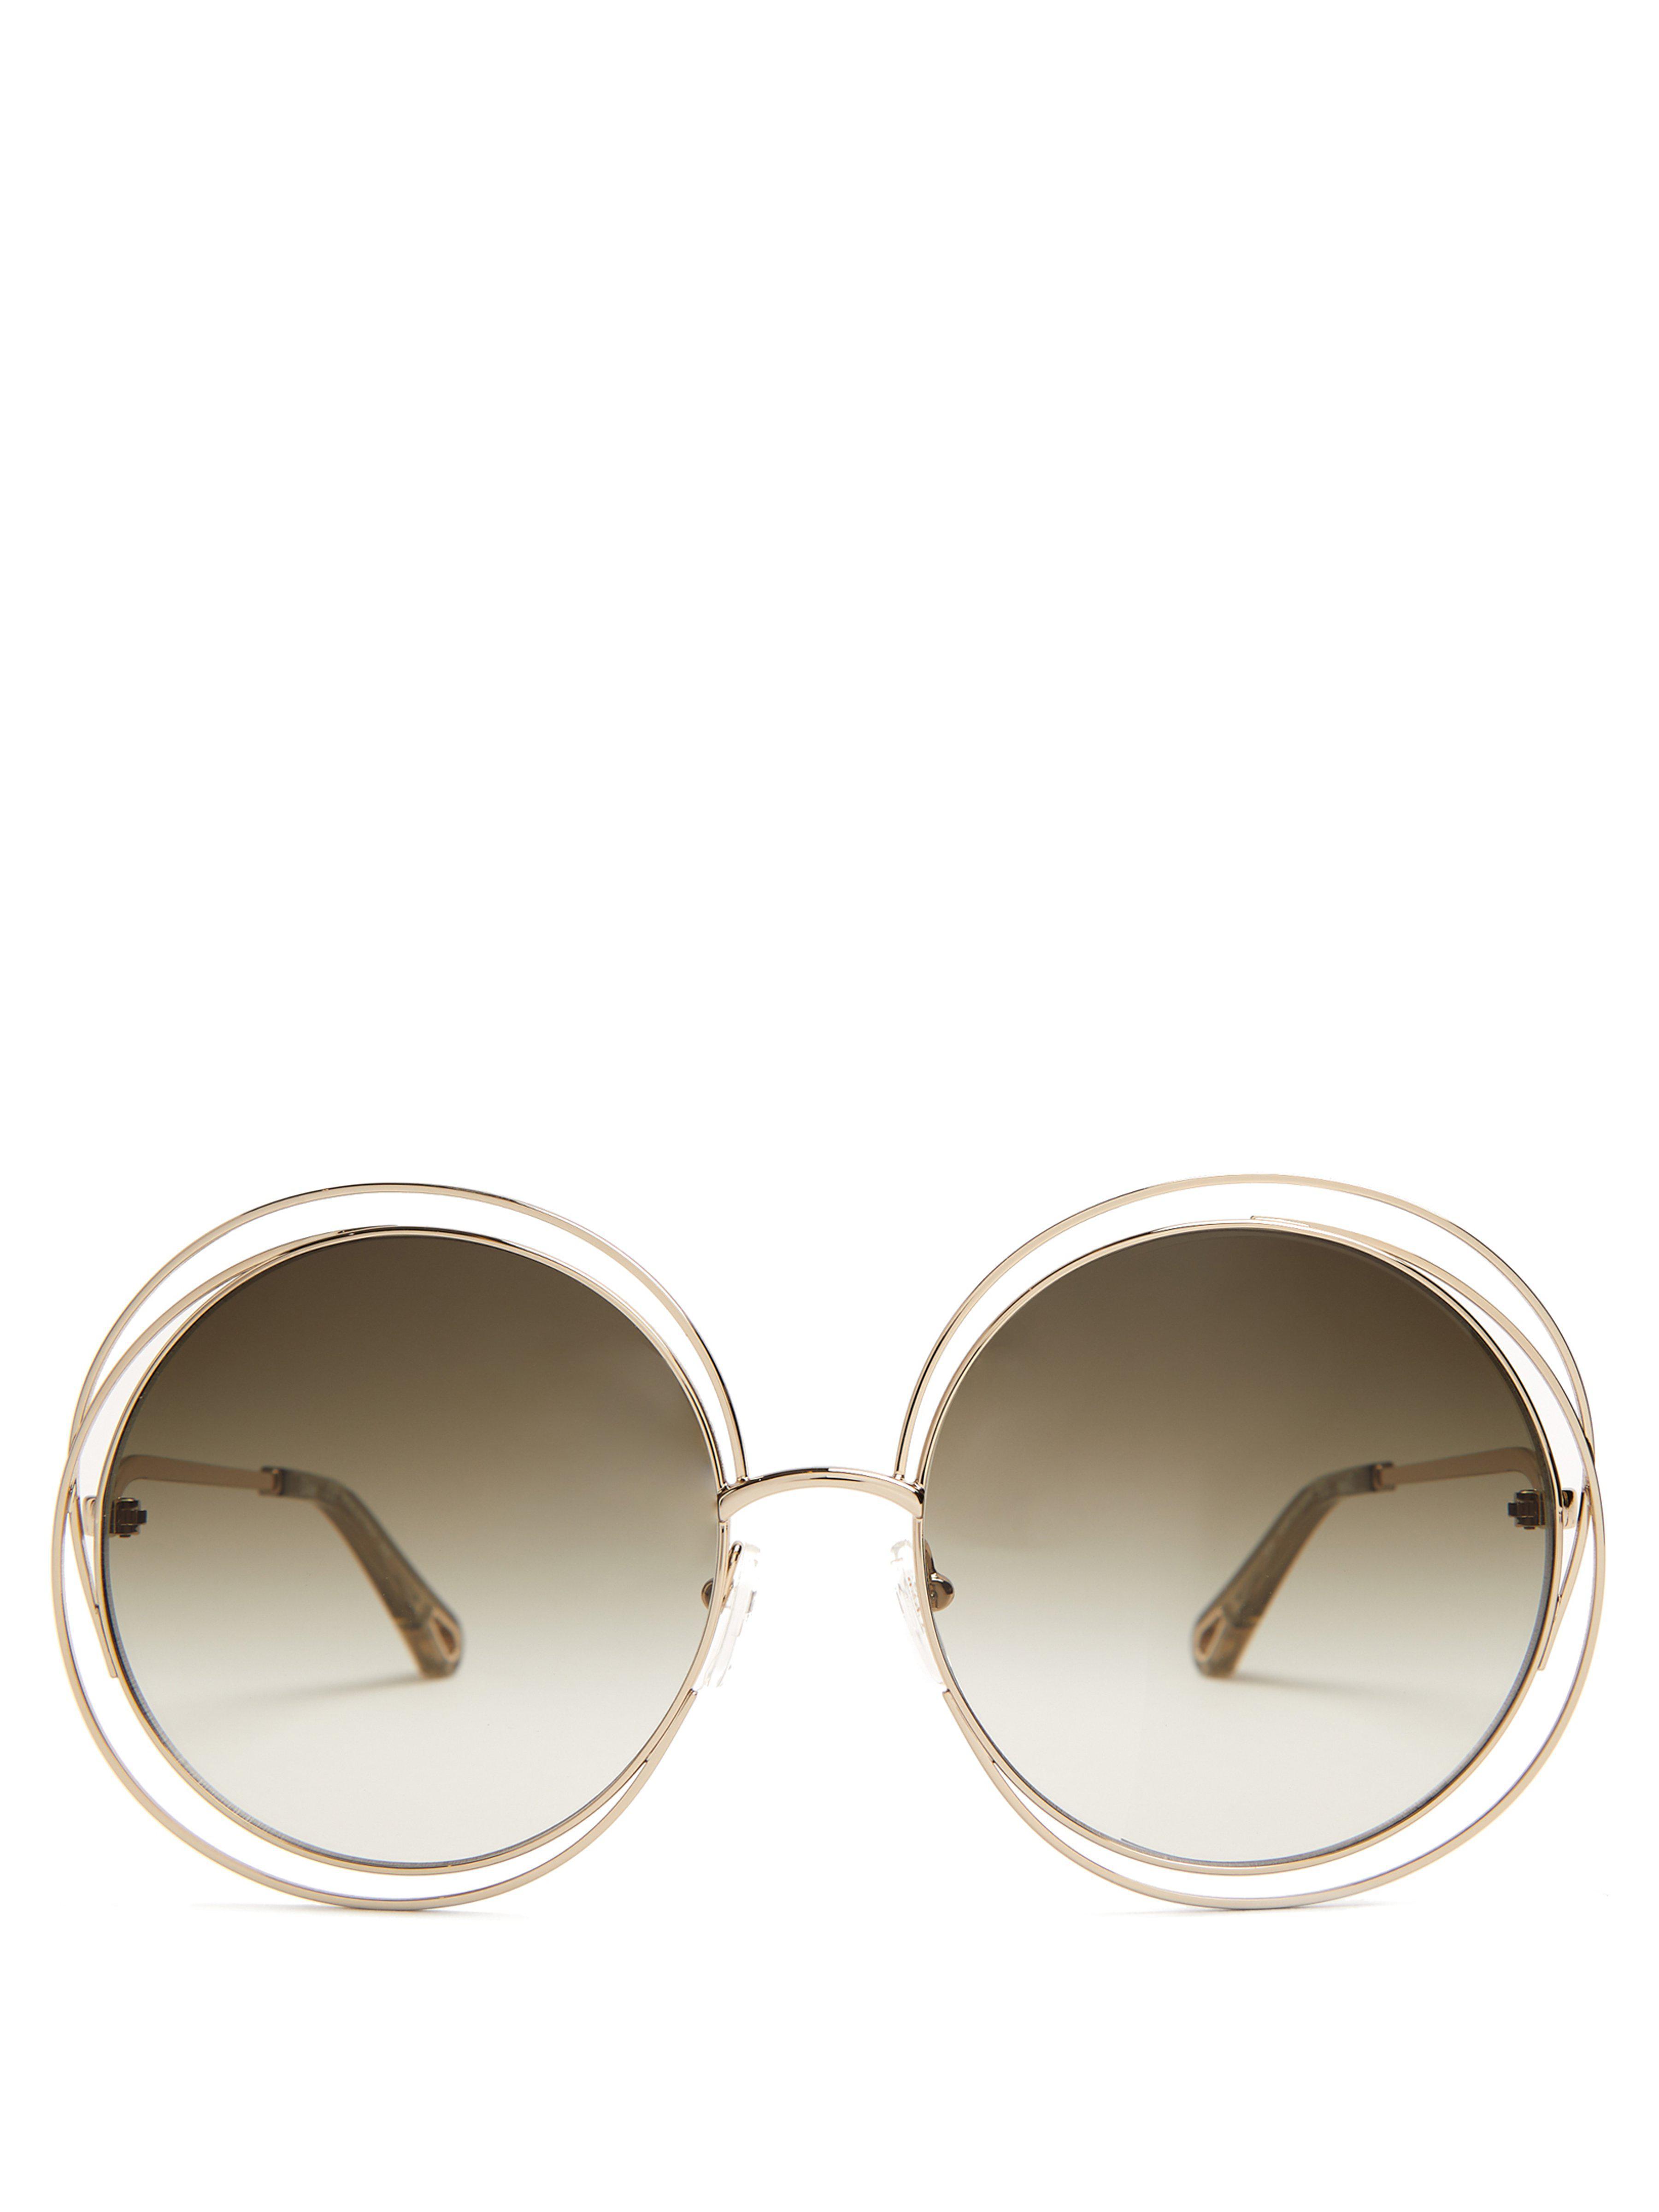 ca05c883231 Chloé Carlina Round Frame Sunglasses in Gray - Lyst